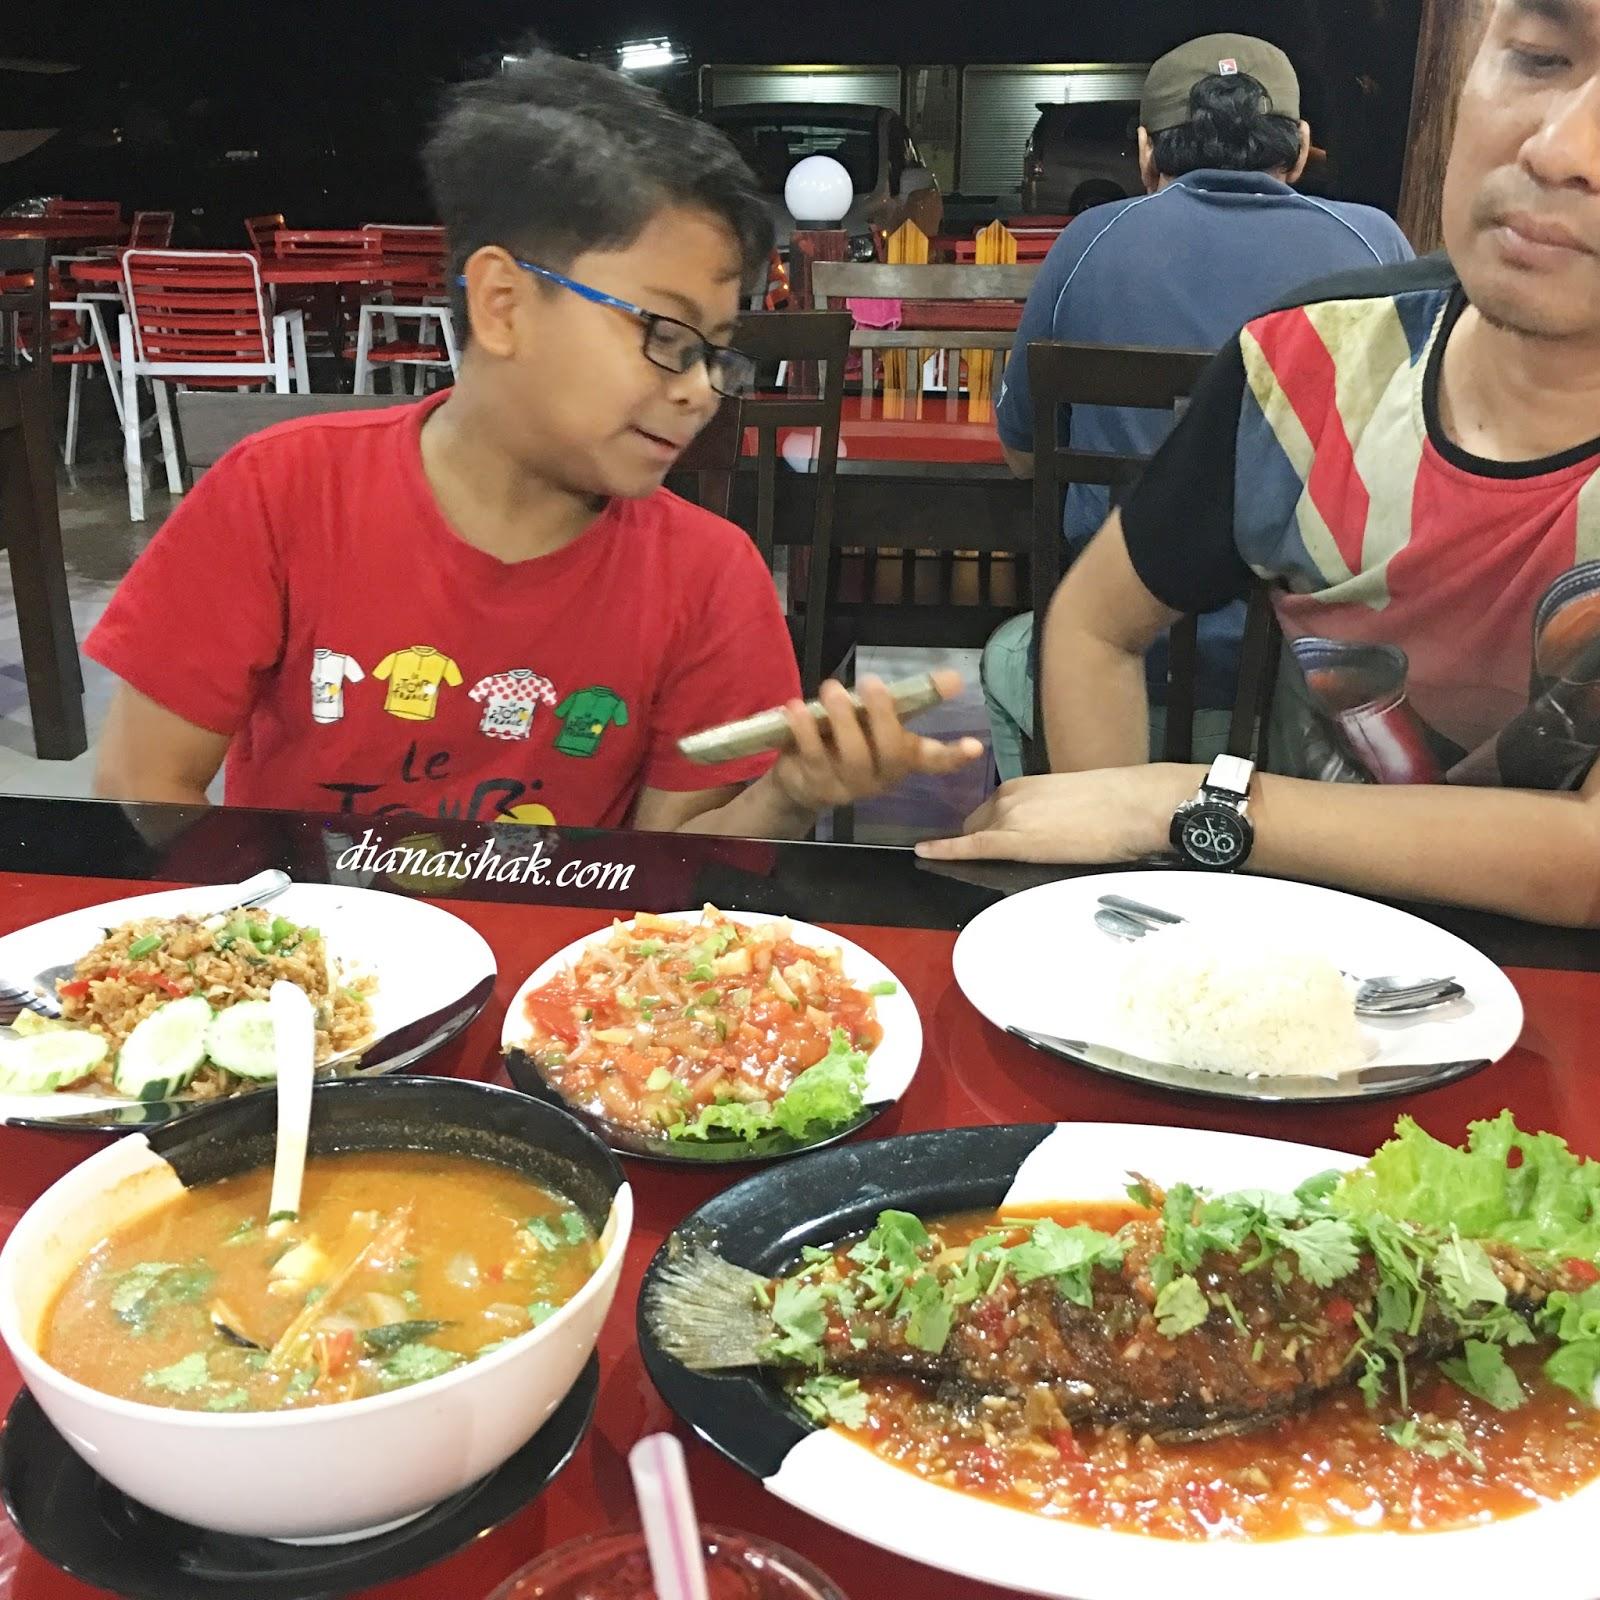 Malam Keluar Makan Lagi Sekarang Rumah Mak Mertua Aku Kat Tganu Tu Dah Ala Homestay Dapur Ada Tapi Tak Guna Balik Untuk Tengok Tv And Tido Je